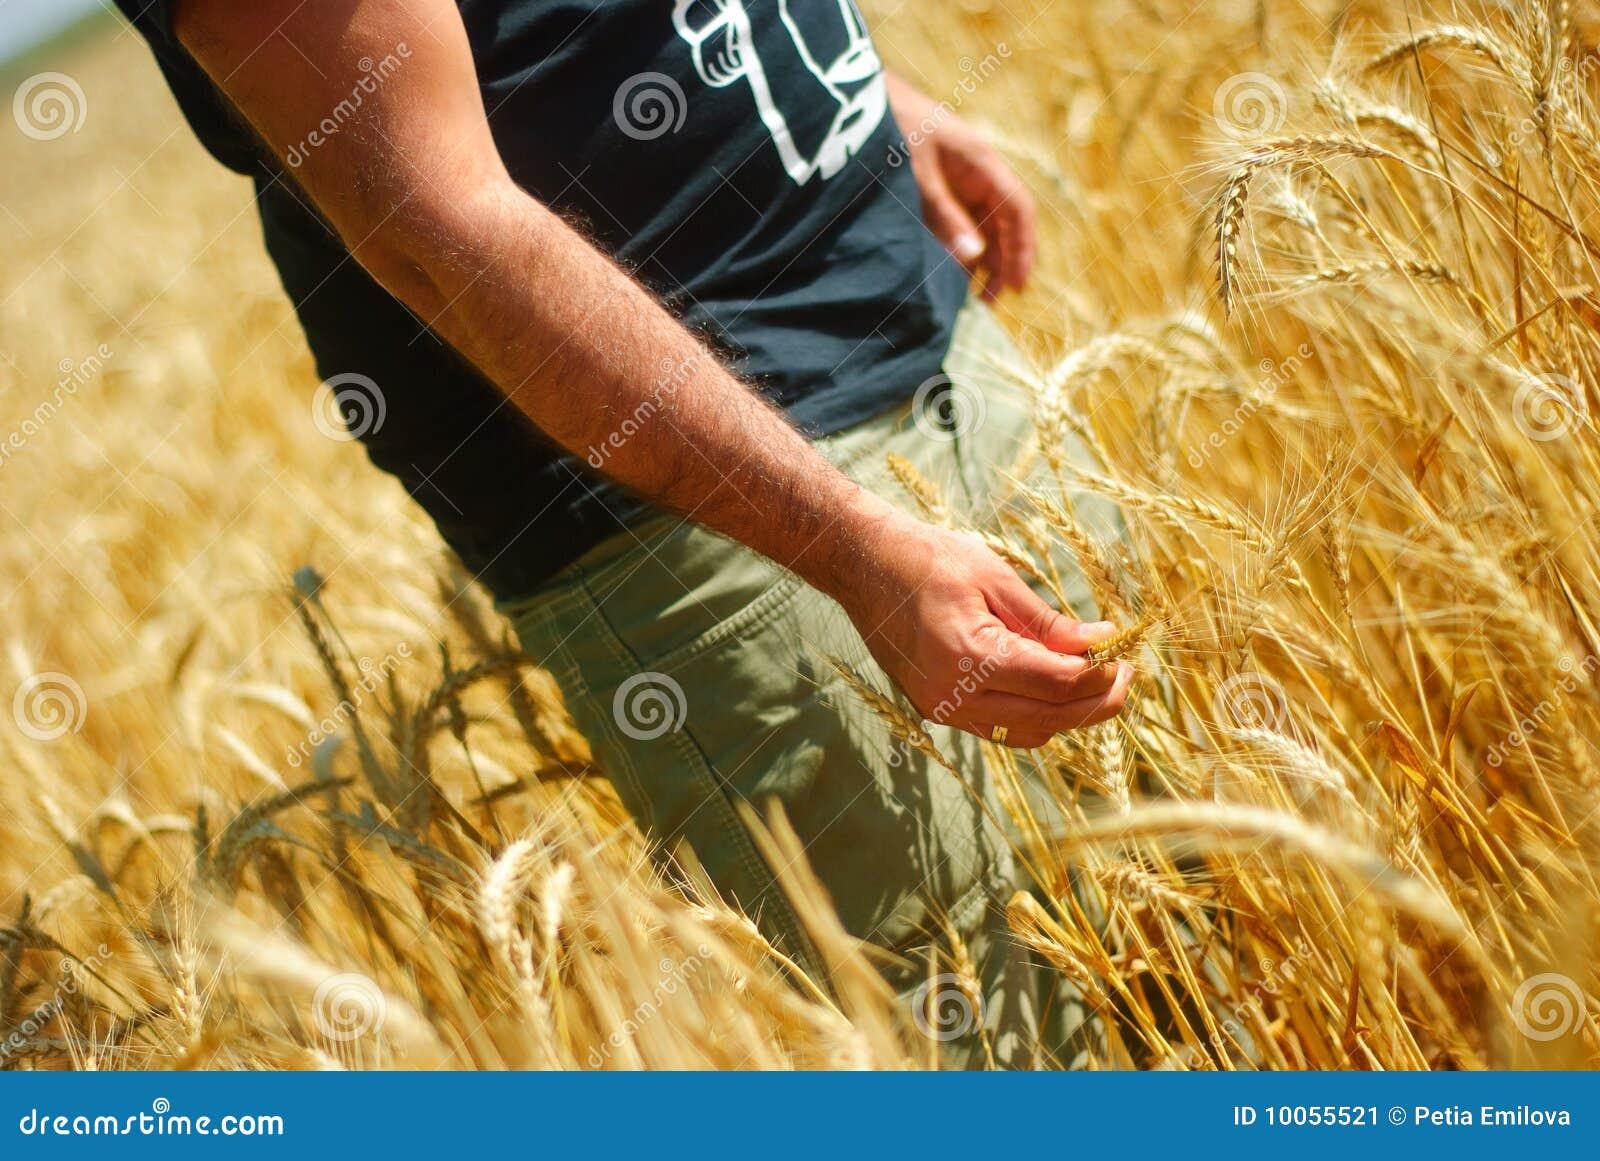 Homem no corn-field